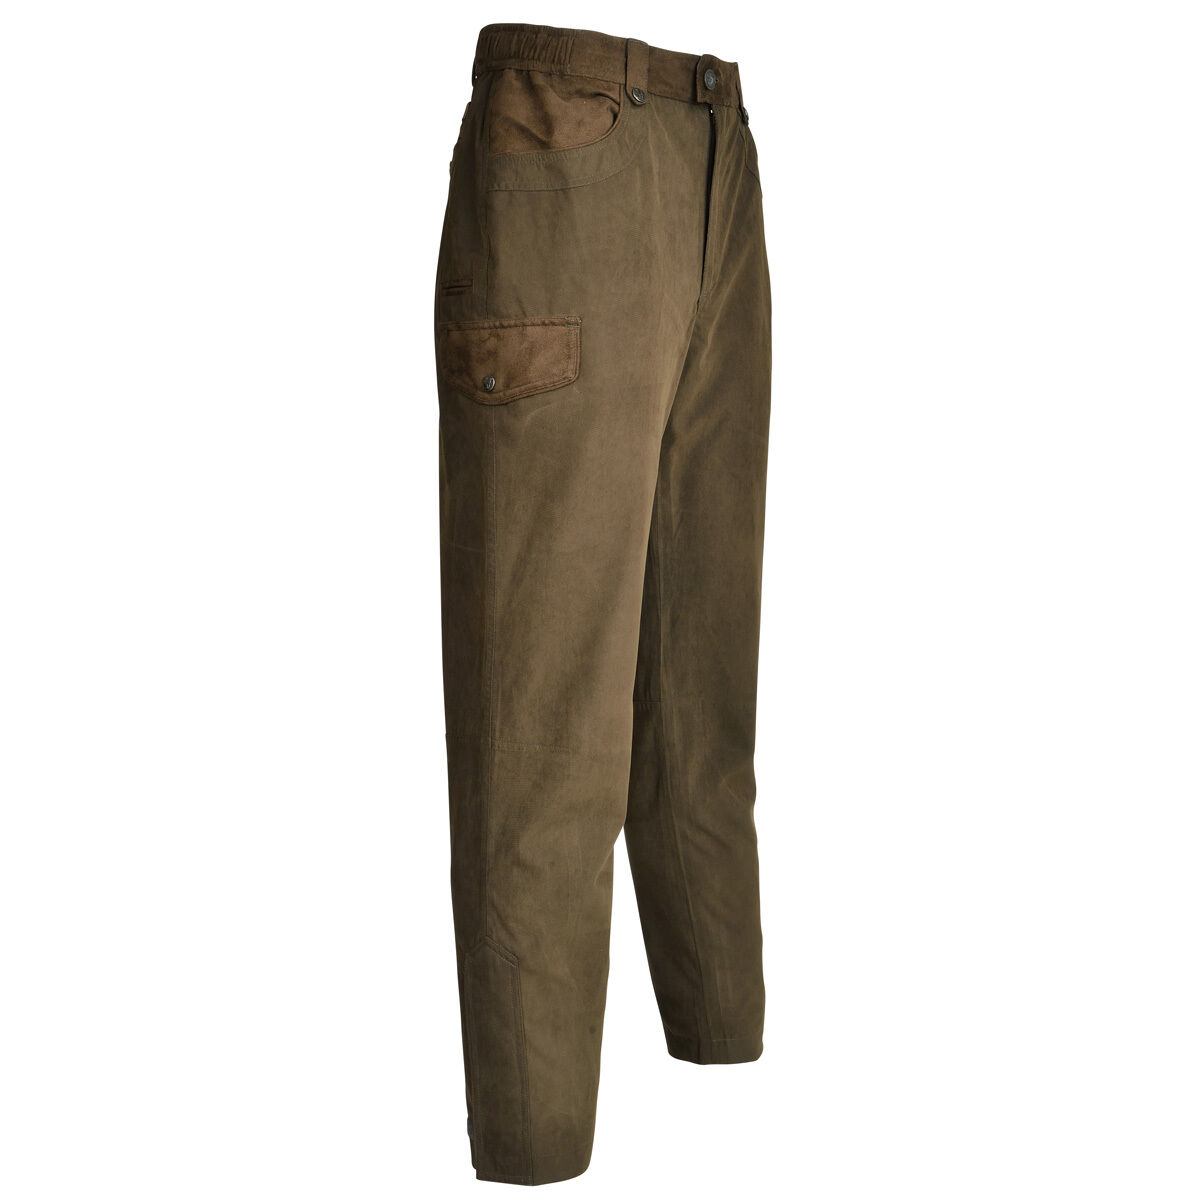 RAMBOUILLET HUNTING TROUSERS - KHAKI GREEN - Shooting Fishing Waterproof Pants